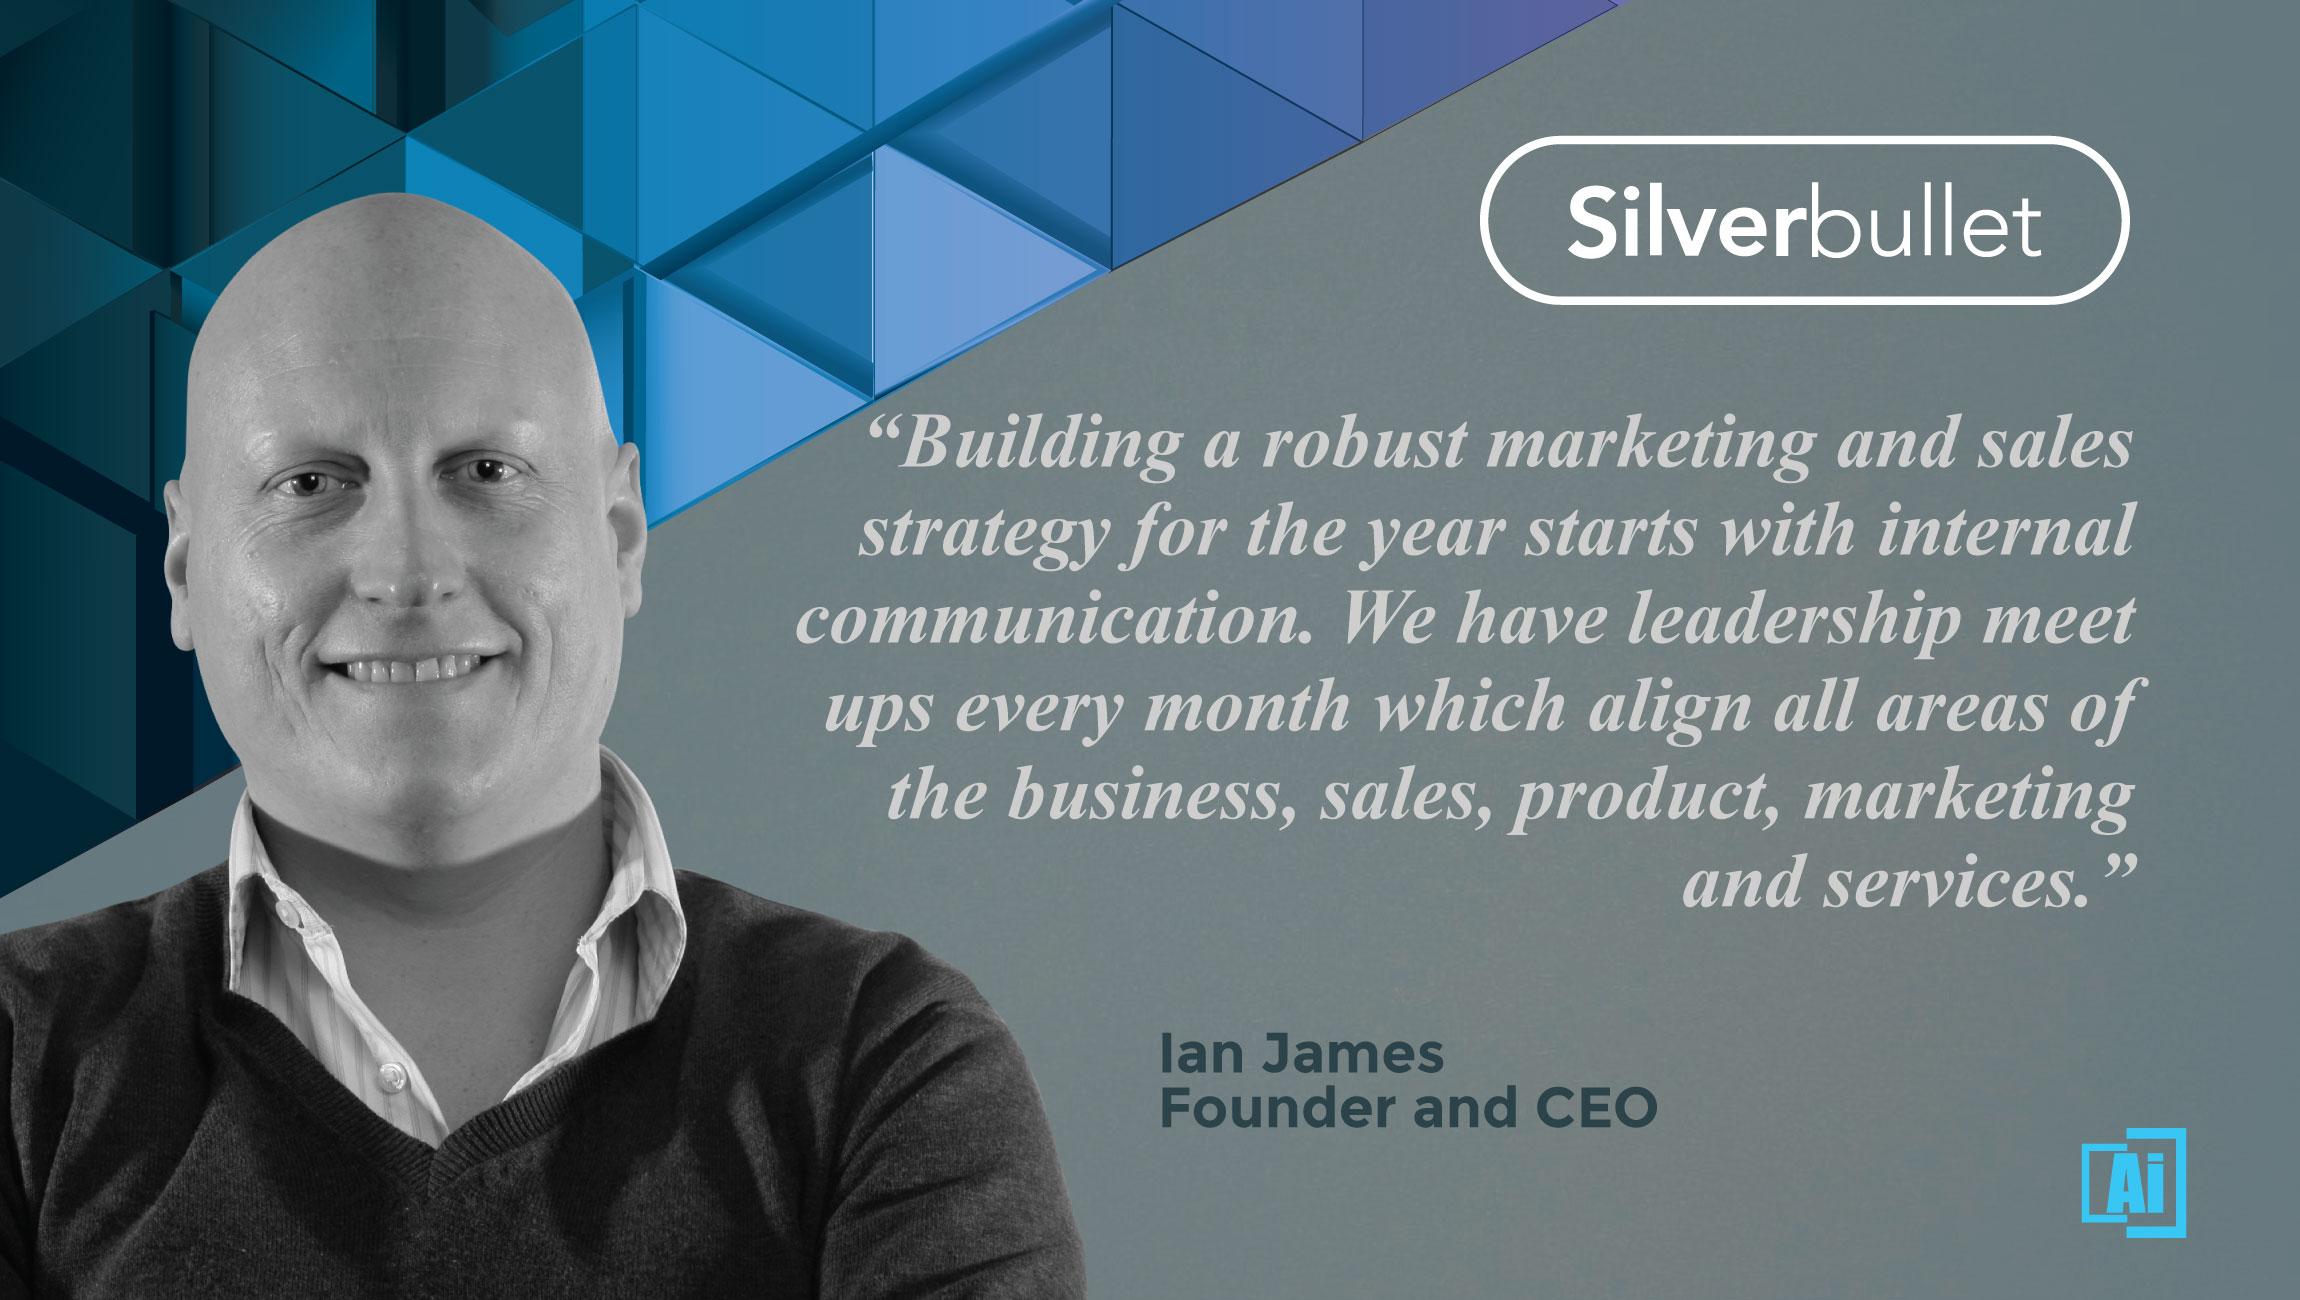 ian james, silverbullet CEO - quotes